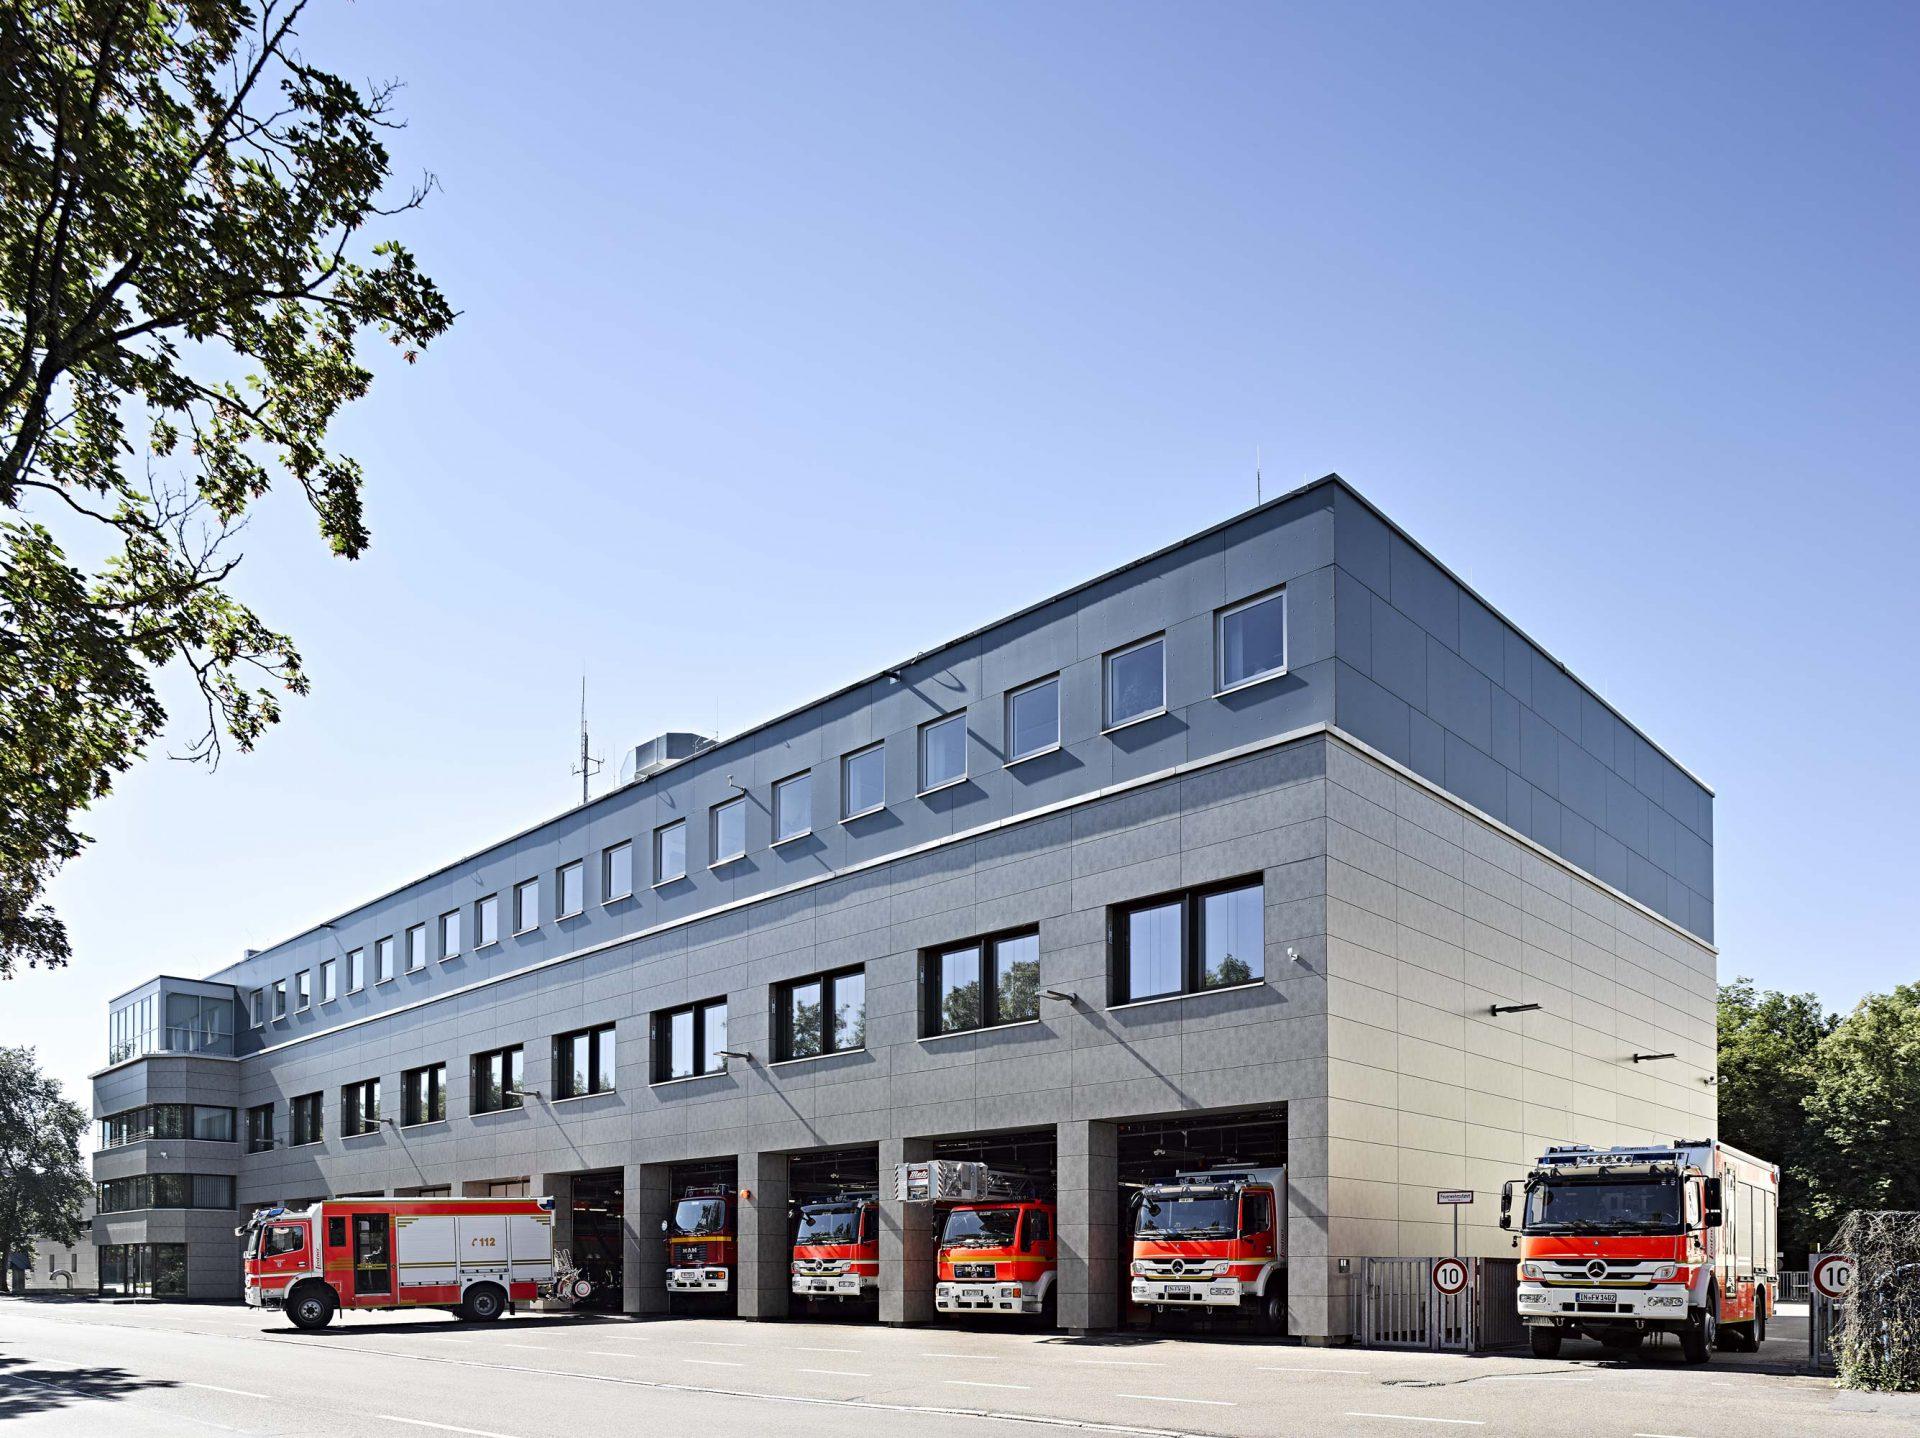 Feuerwehr-Ingolstadt